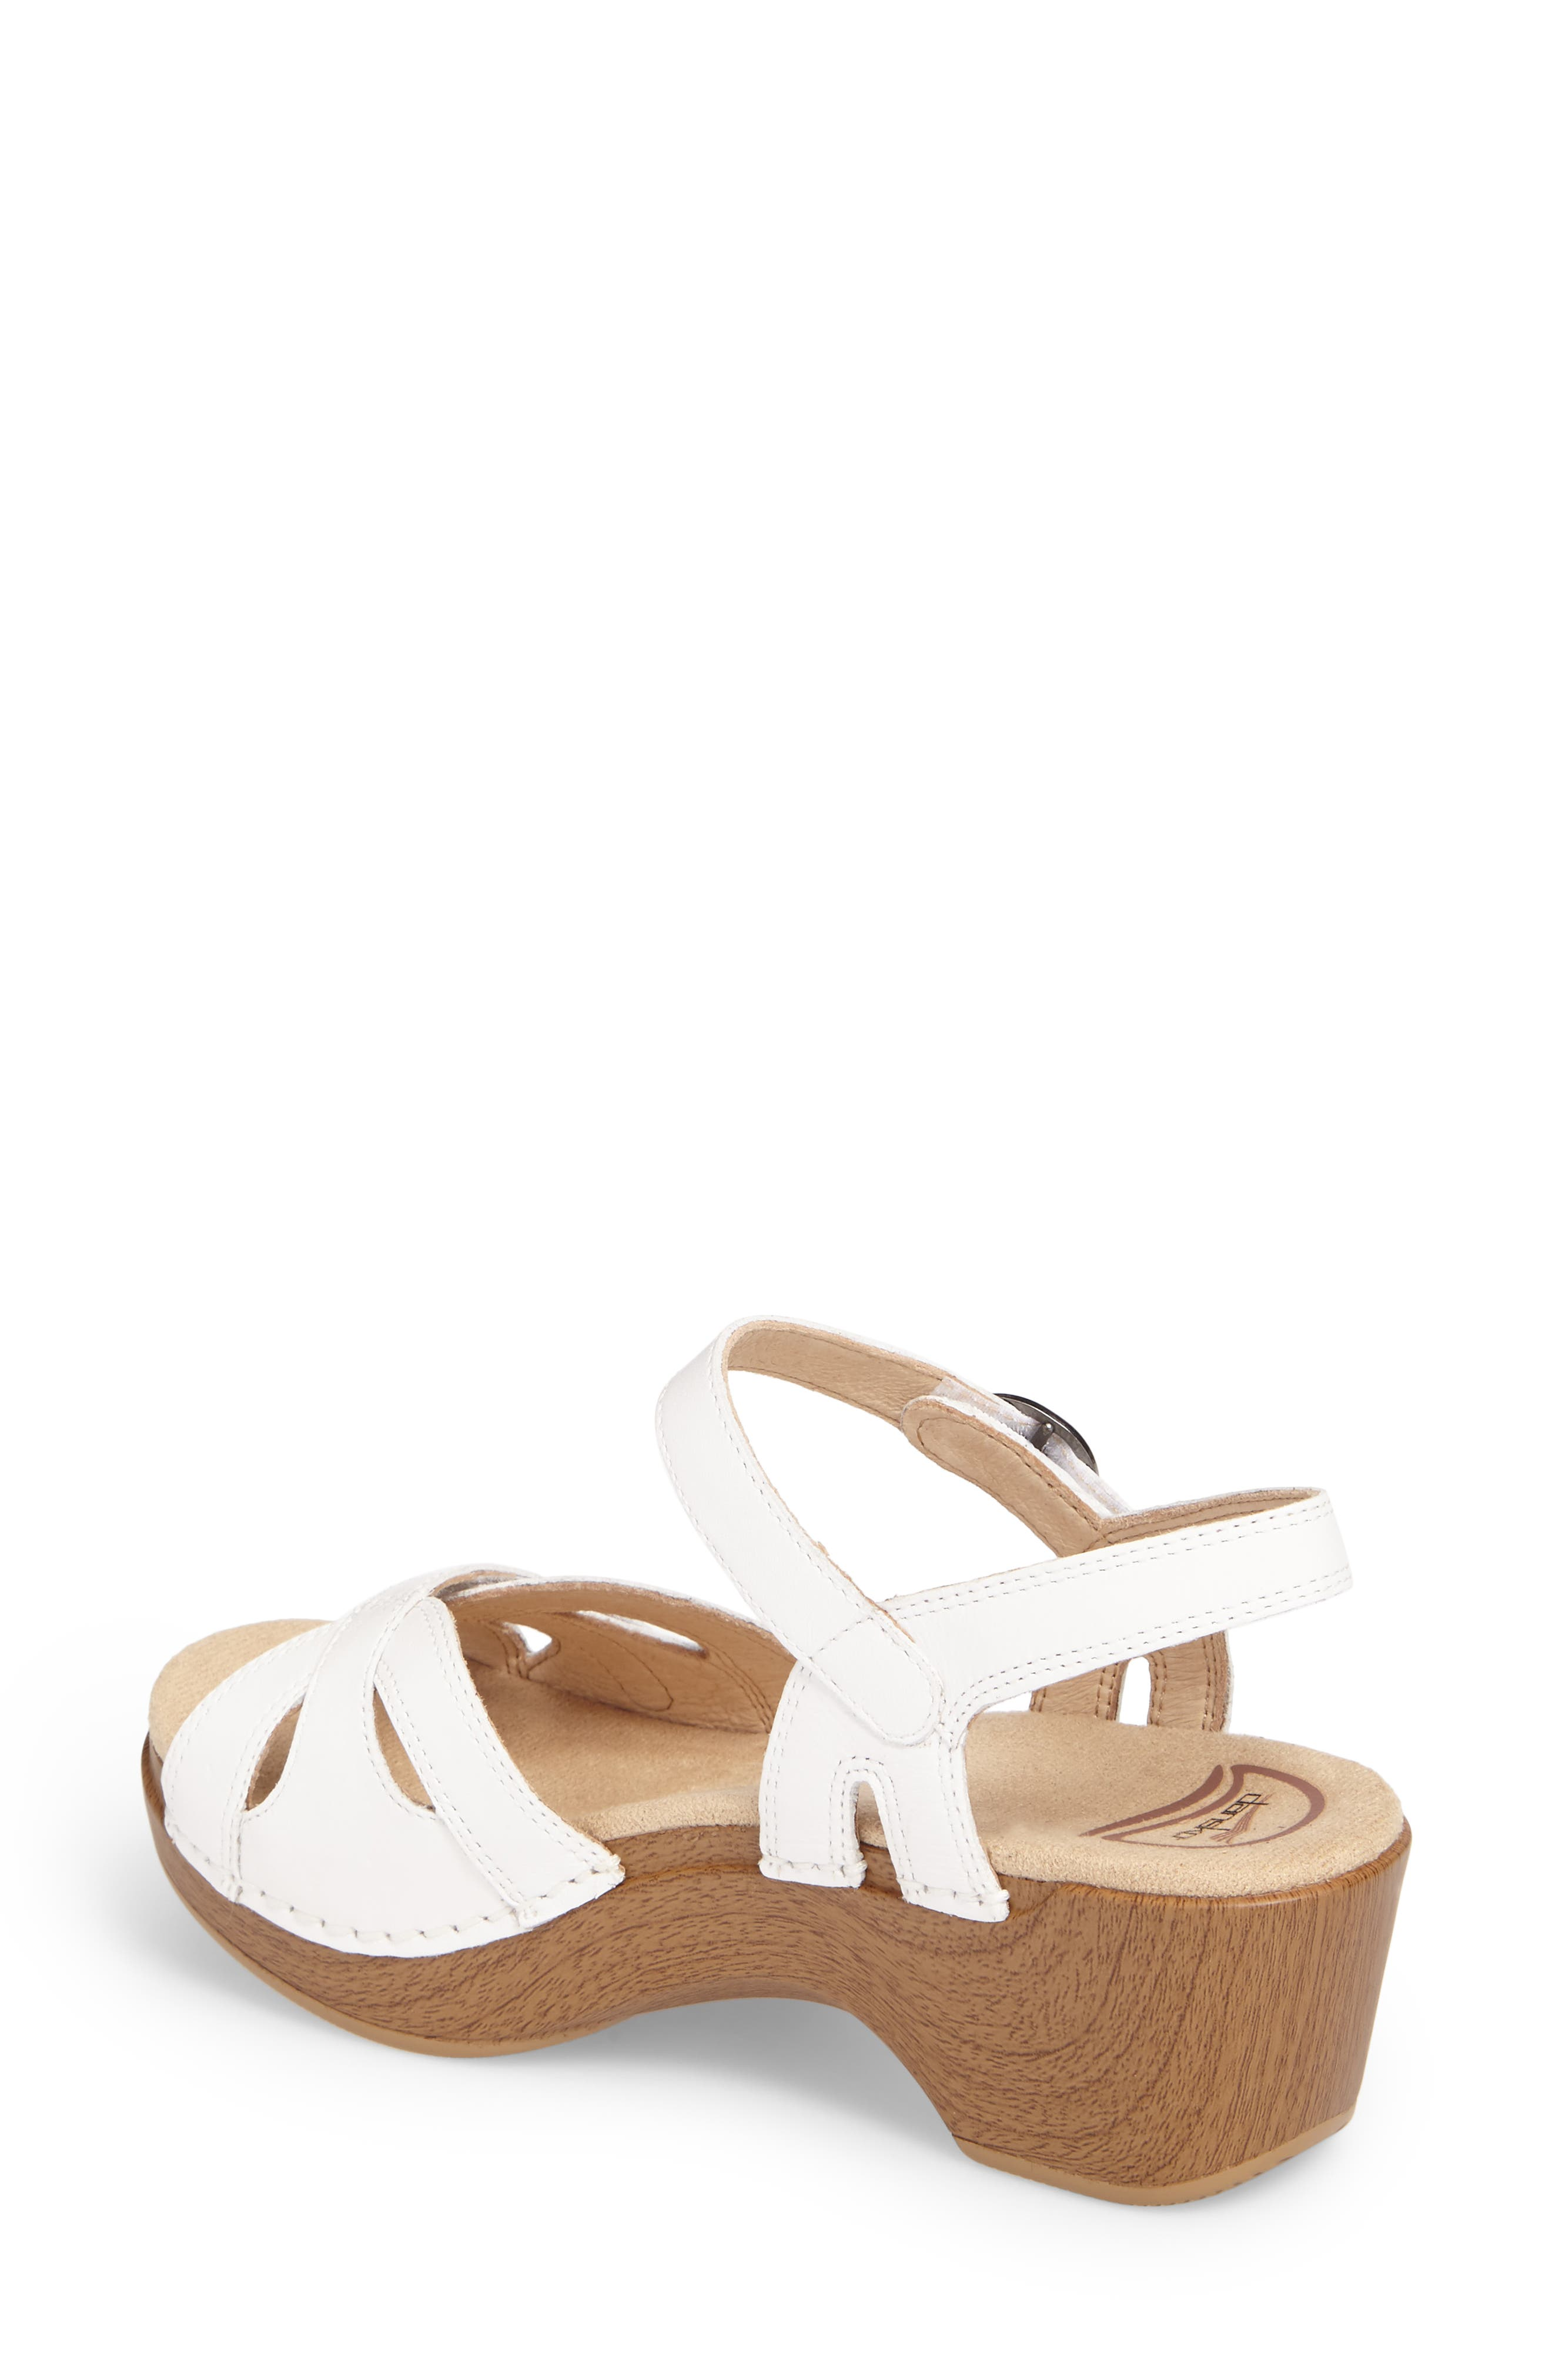 Season Sandal,                             Alternate thumbnail 2, color,                             White Leather